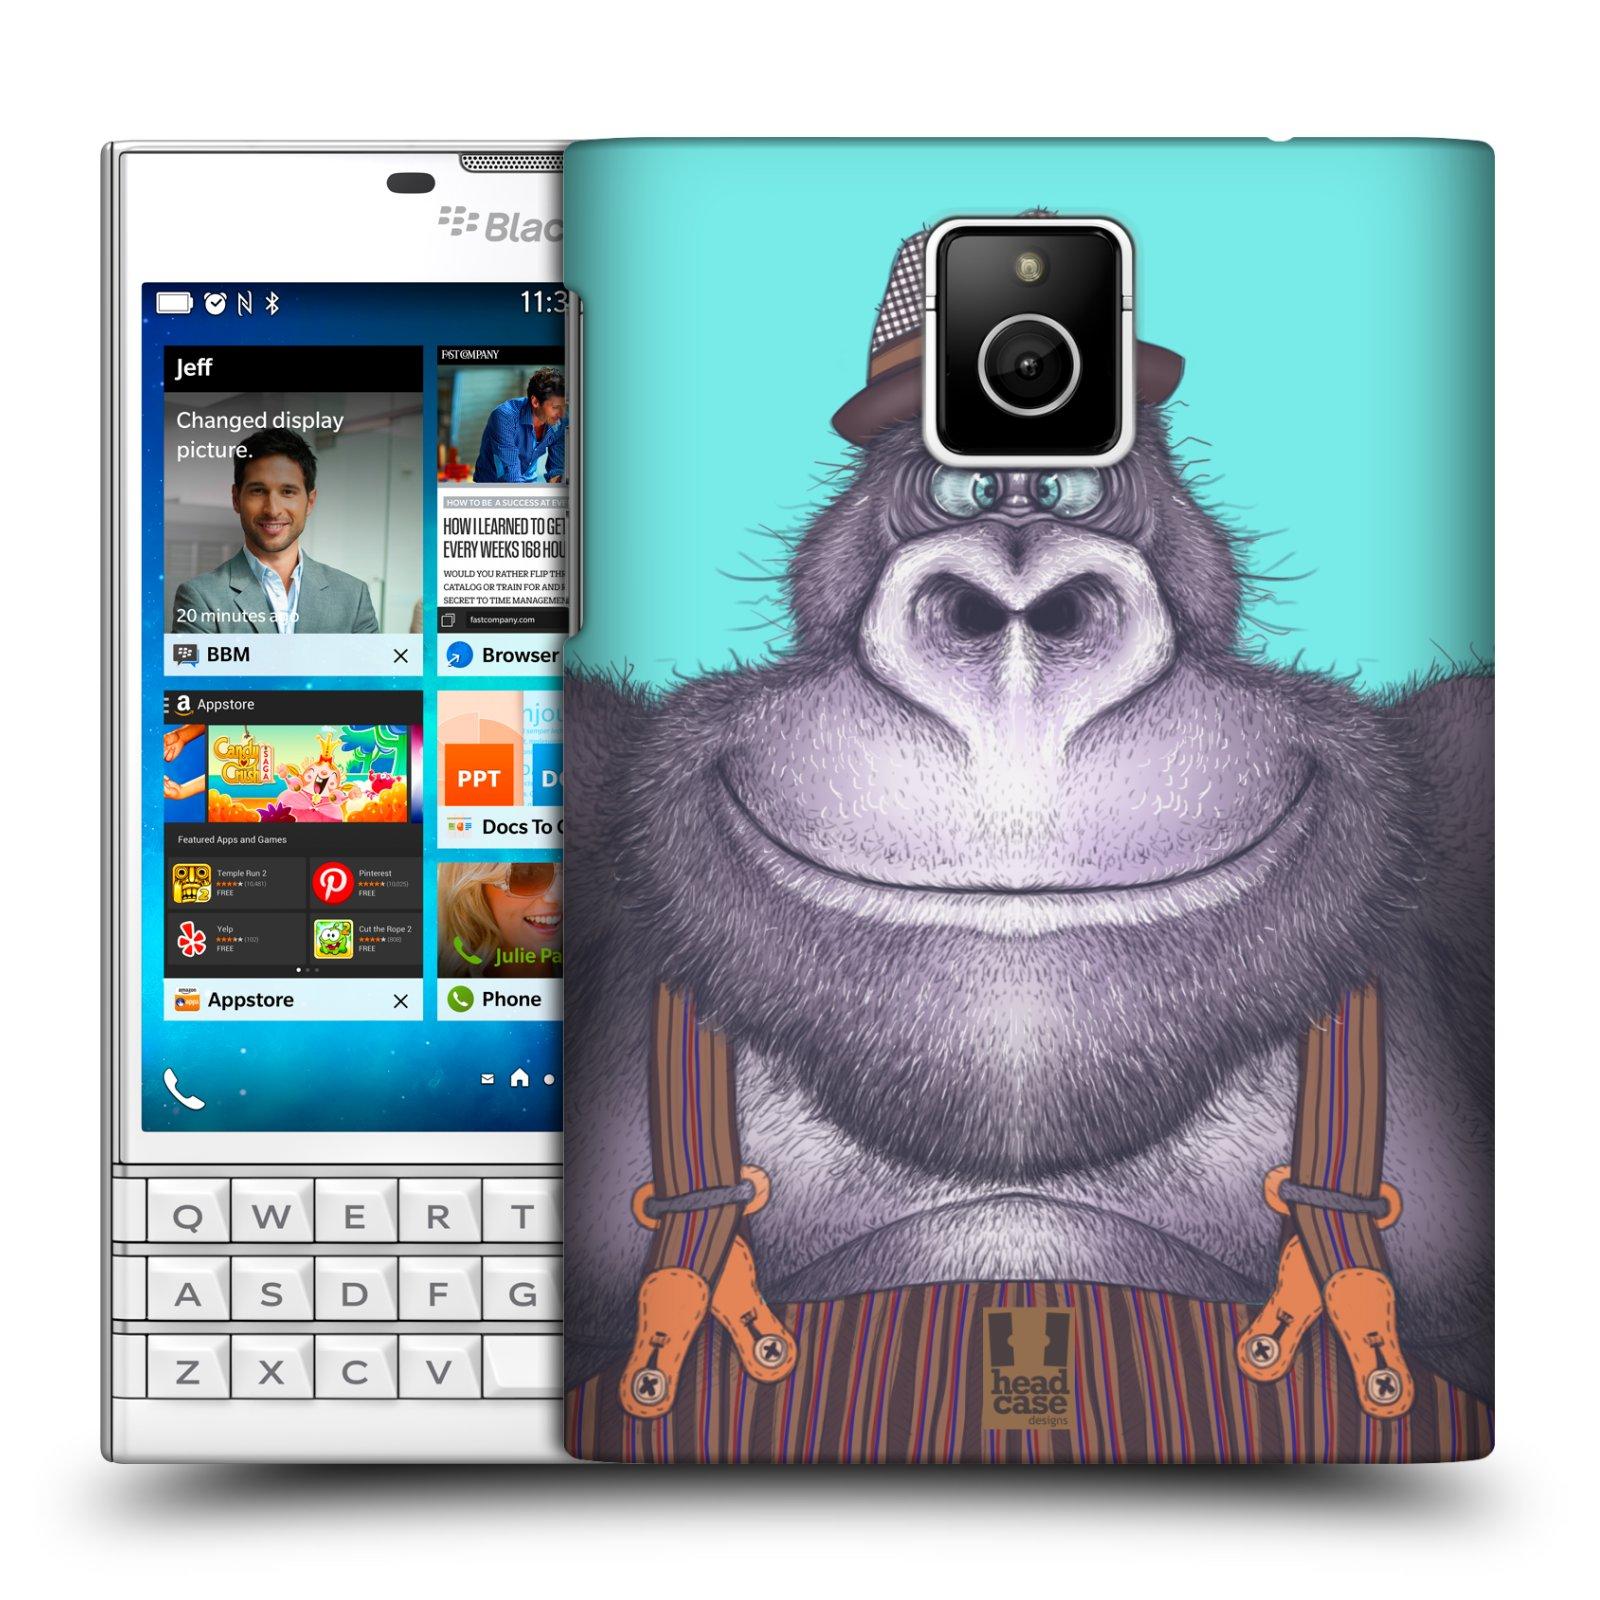 HEAD CASE plastový obal na mobil BlackBerry Passport vzor Kreslená zvířátka gorila